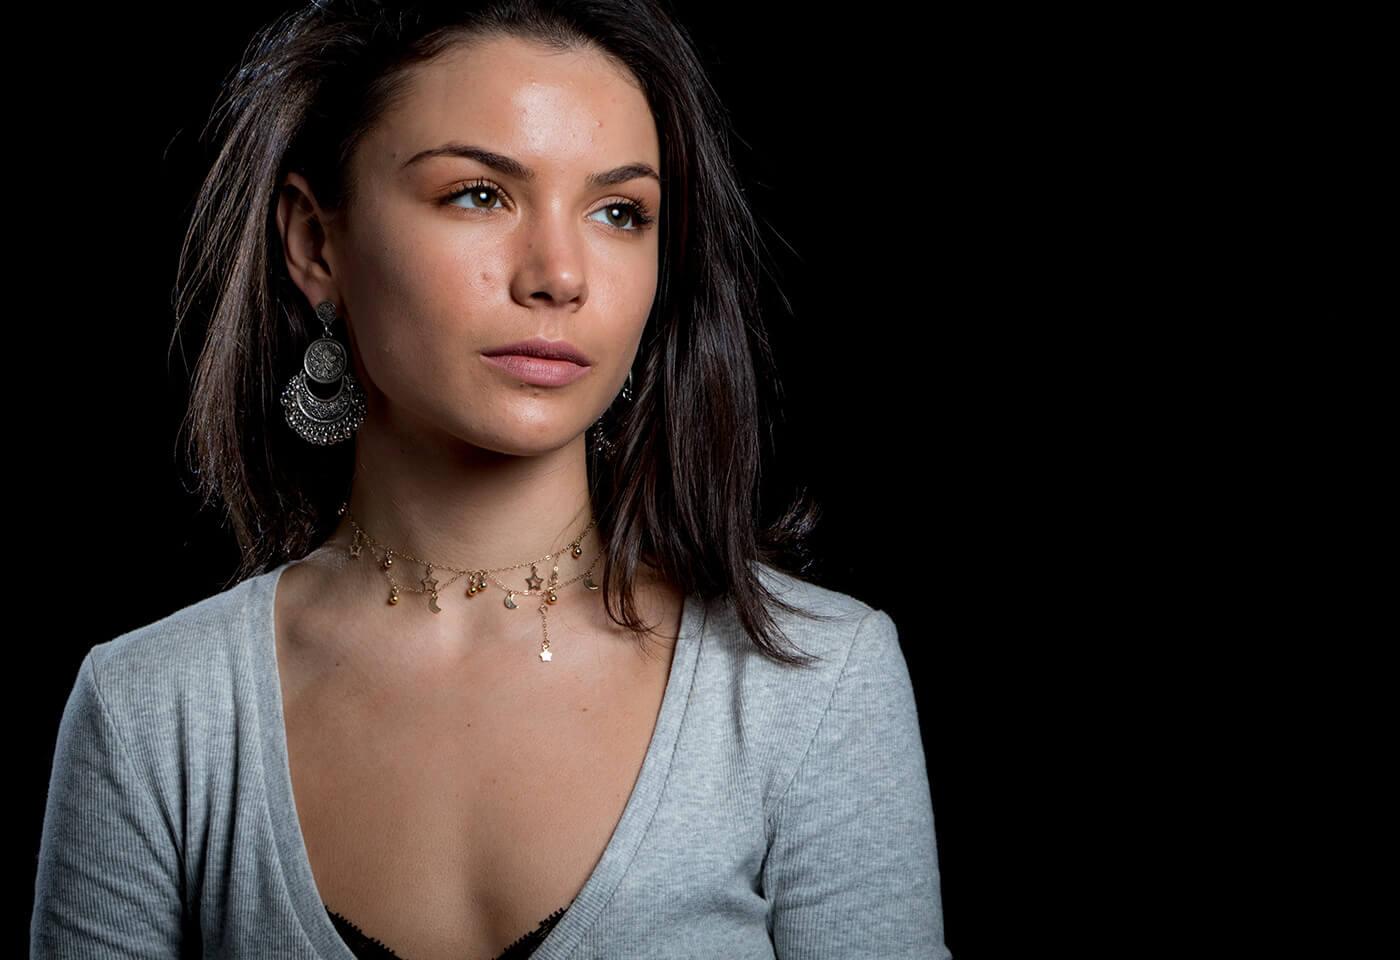 Professional portrait of model on black backdrop